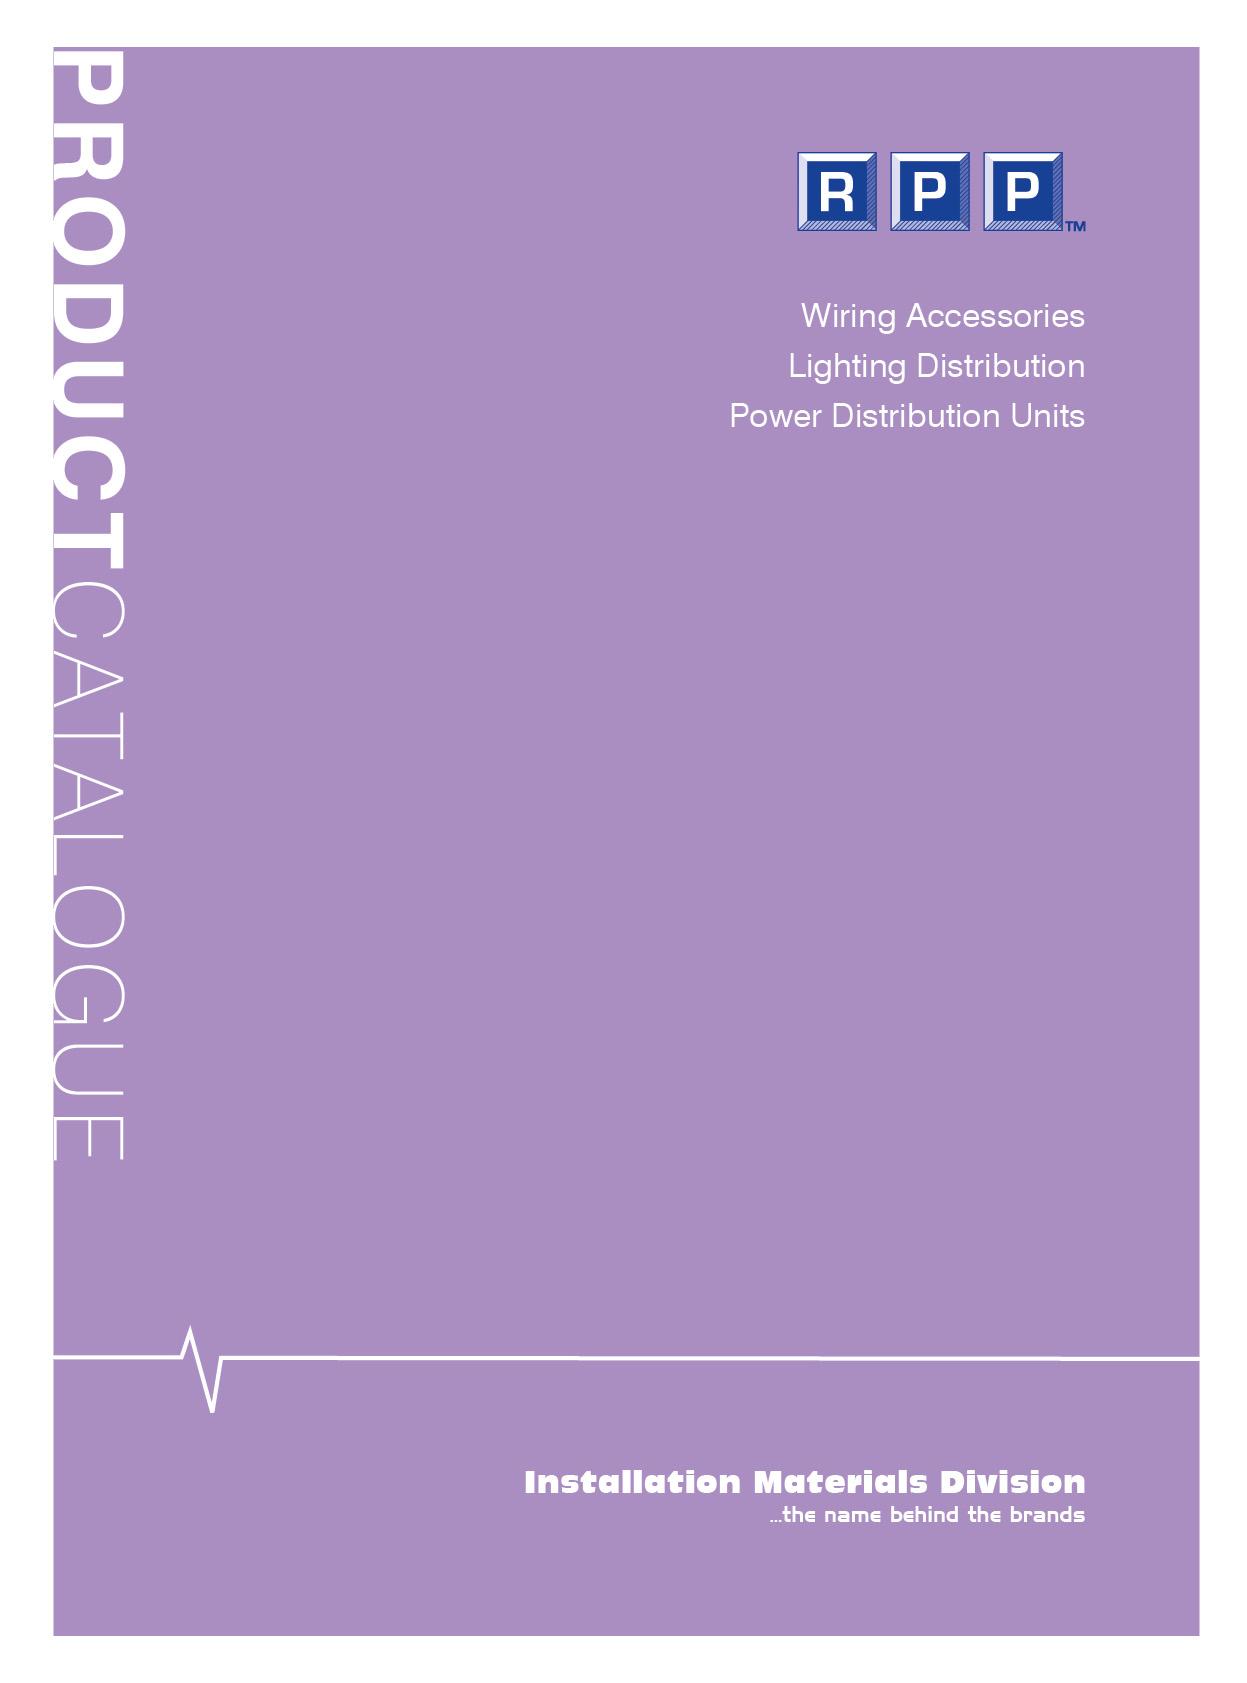 RPP Catalogue